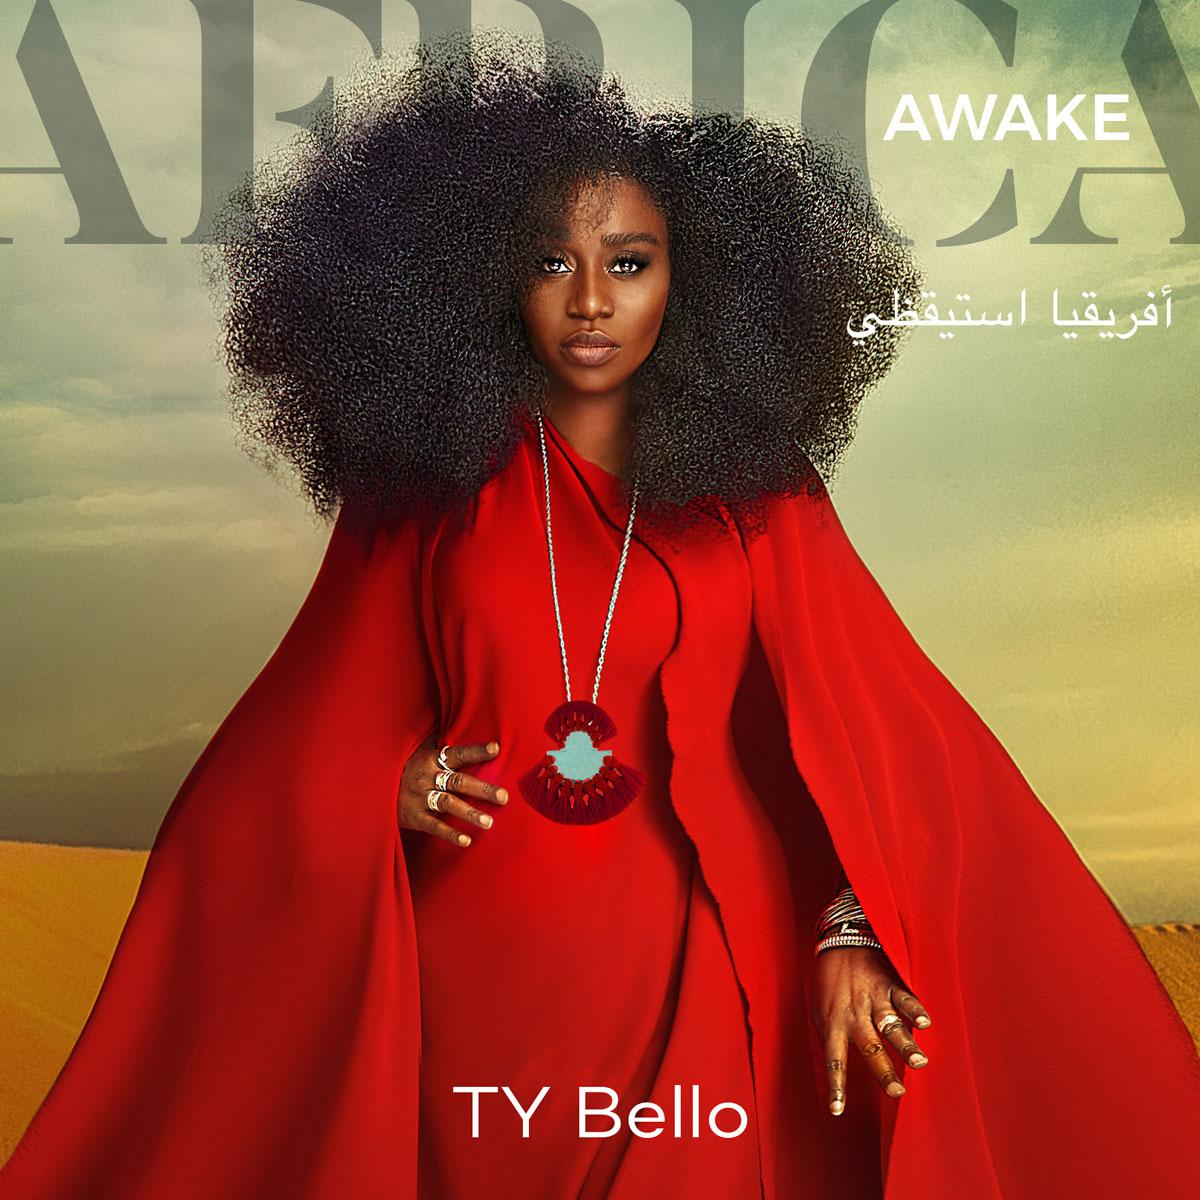 Africa-Awake